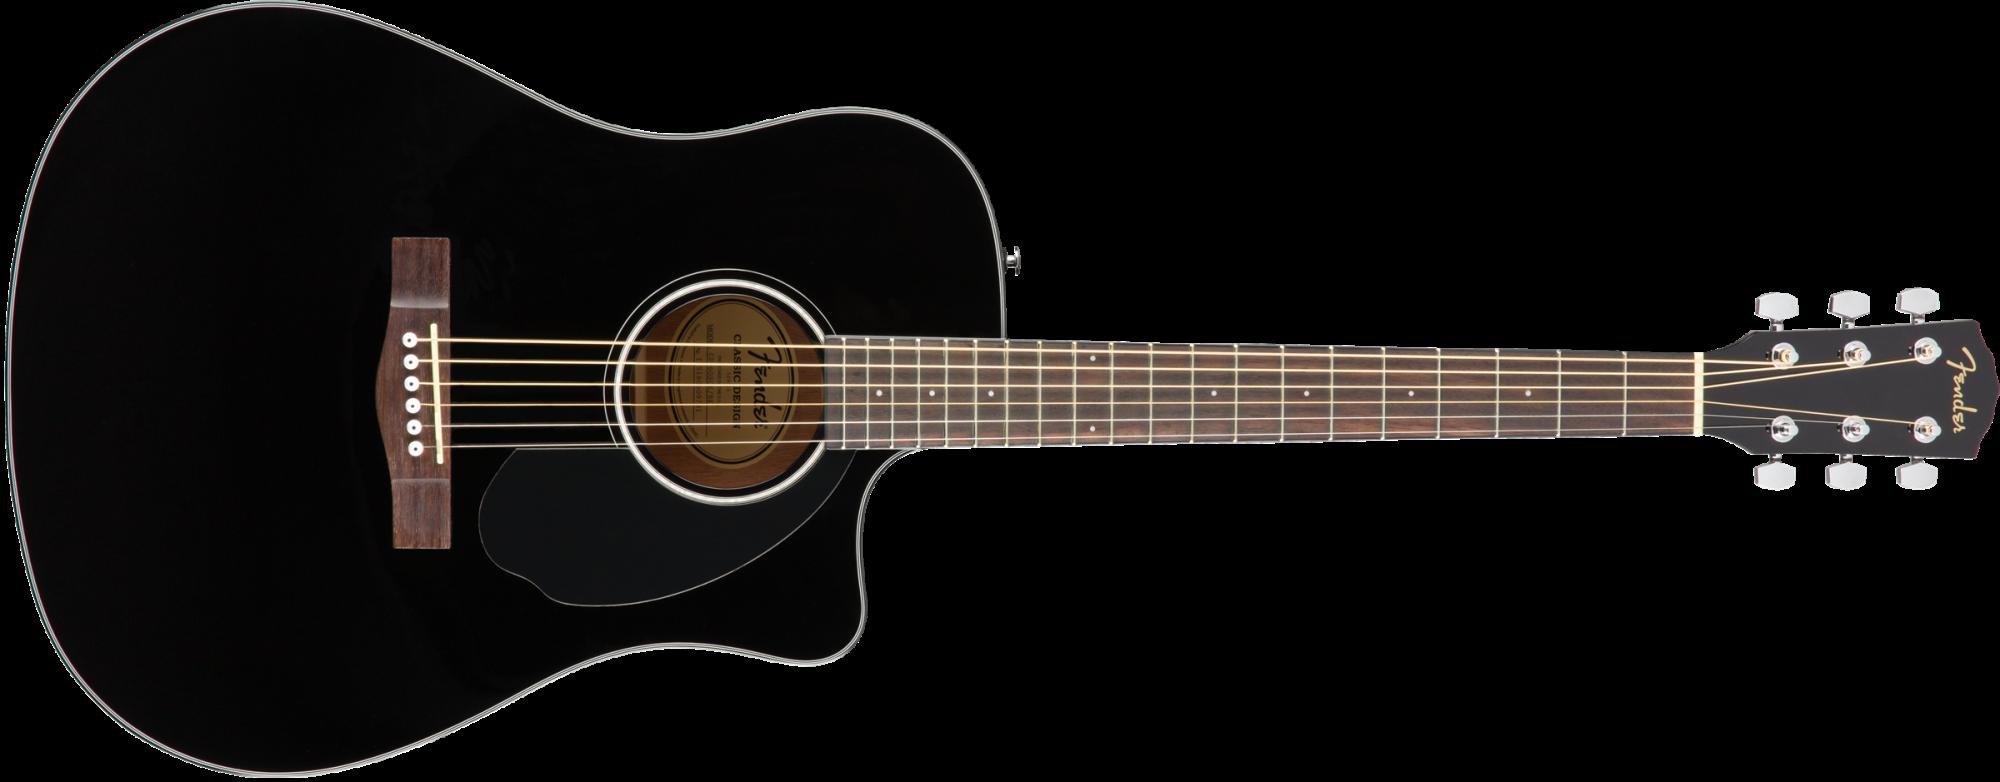 Fender CD-60SCE Dreadnought Acoustic Guitar - Walnut Fingerboard - Black